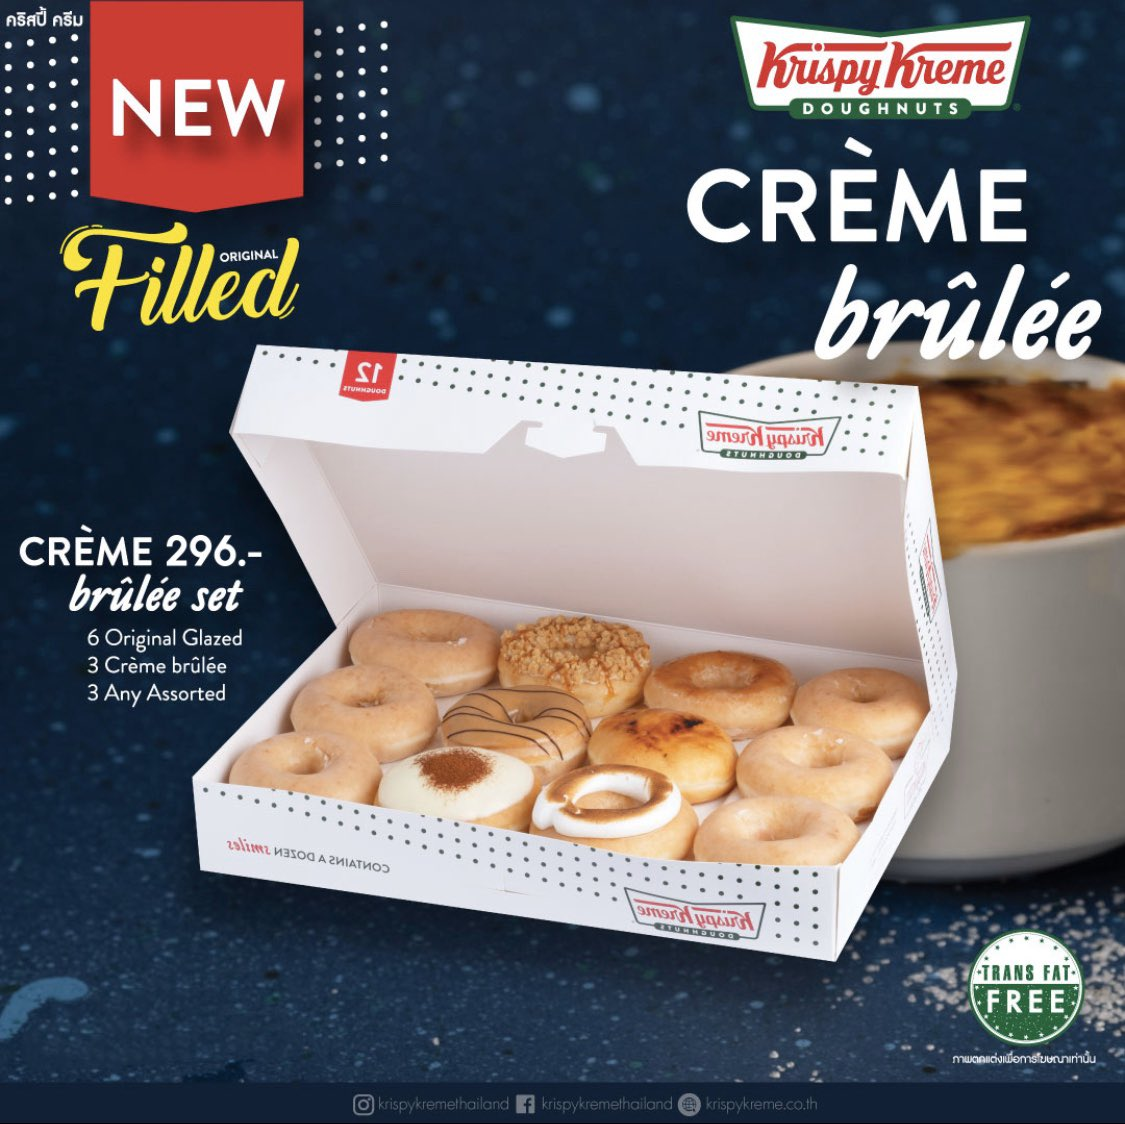 NEW 1 x Krispy Kreme Doughnuts Baker/'s Paper Hat WHAT A DEAL !